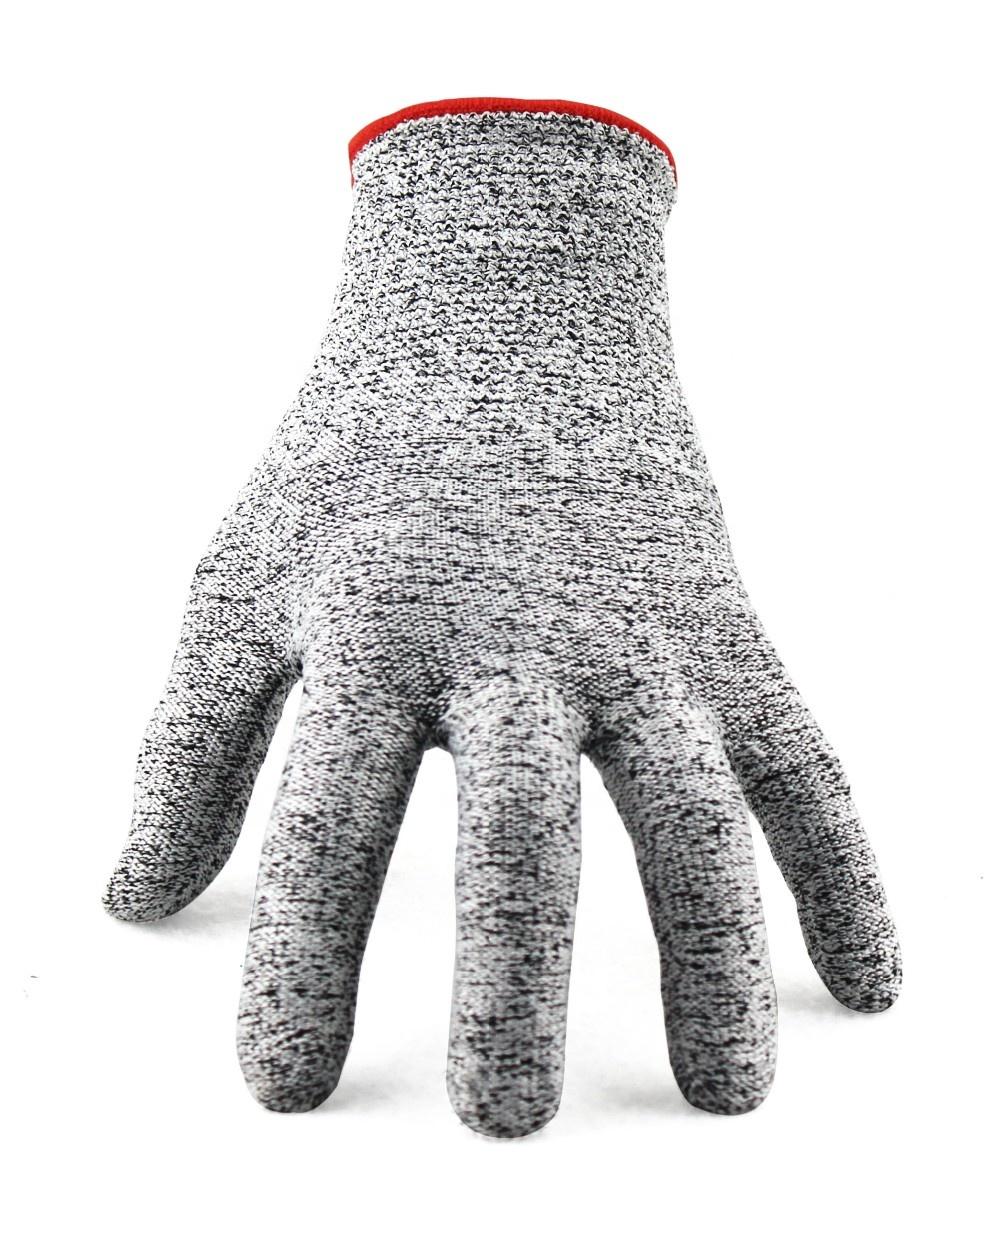 Food Grade Hppe Cut Blade Resistant Level 5 Gloves For Kitchen - Buy Cut  Resistant Gloves,Cut Resistant Gloves For Kitchen,Cut Gloves Product on ...